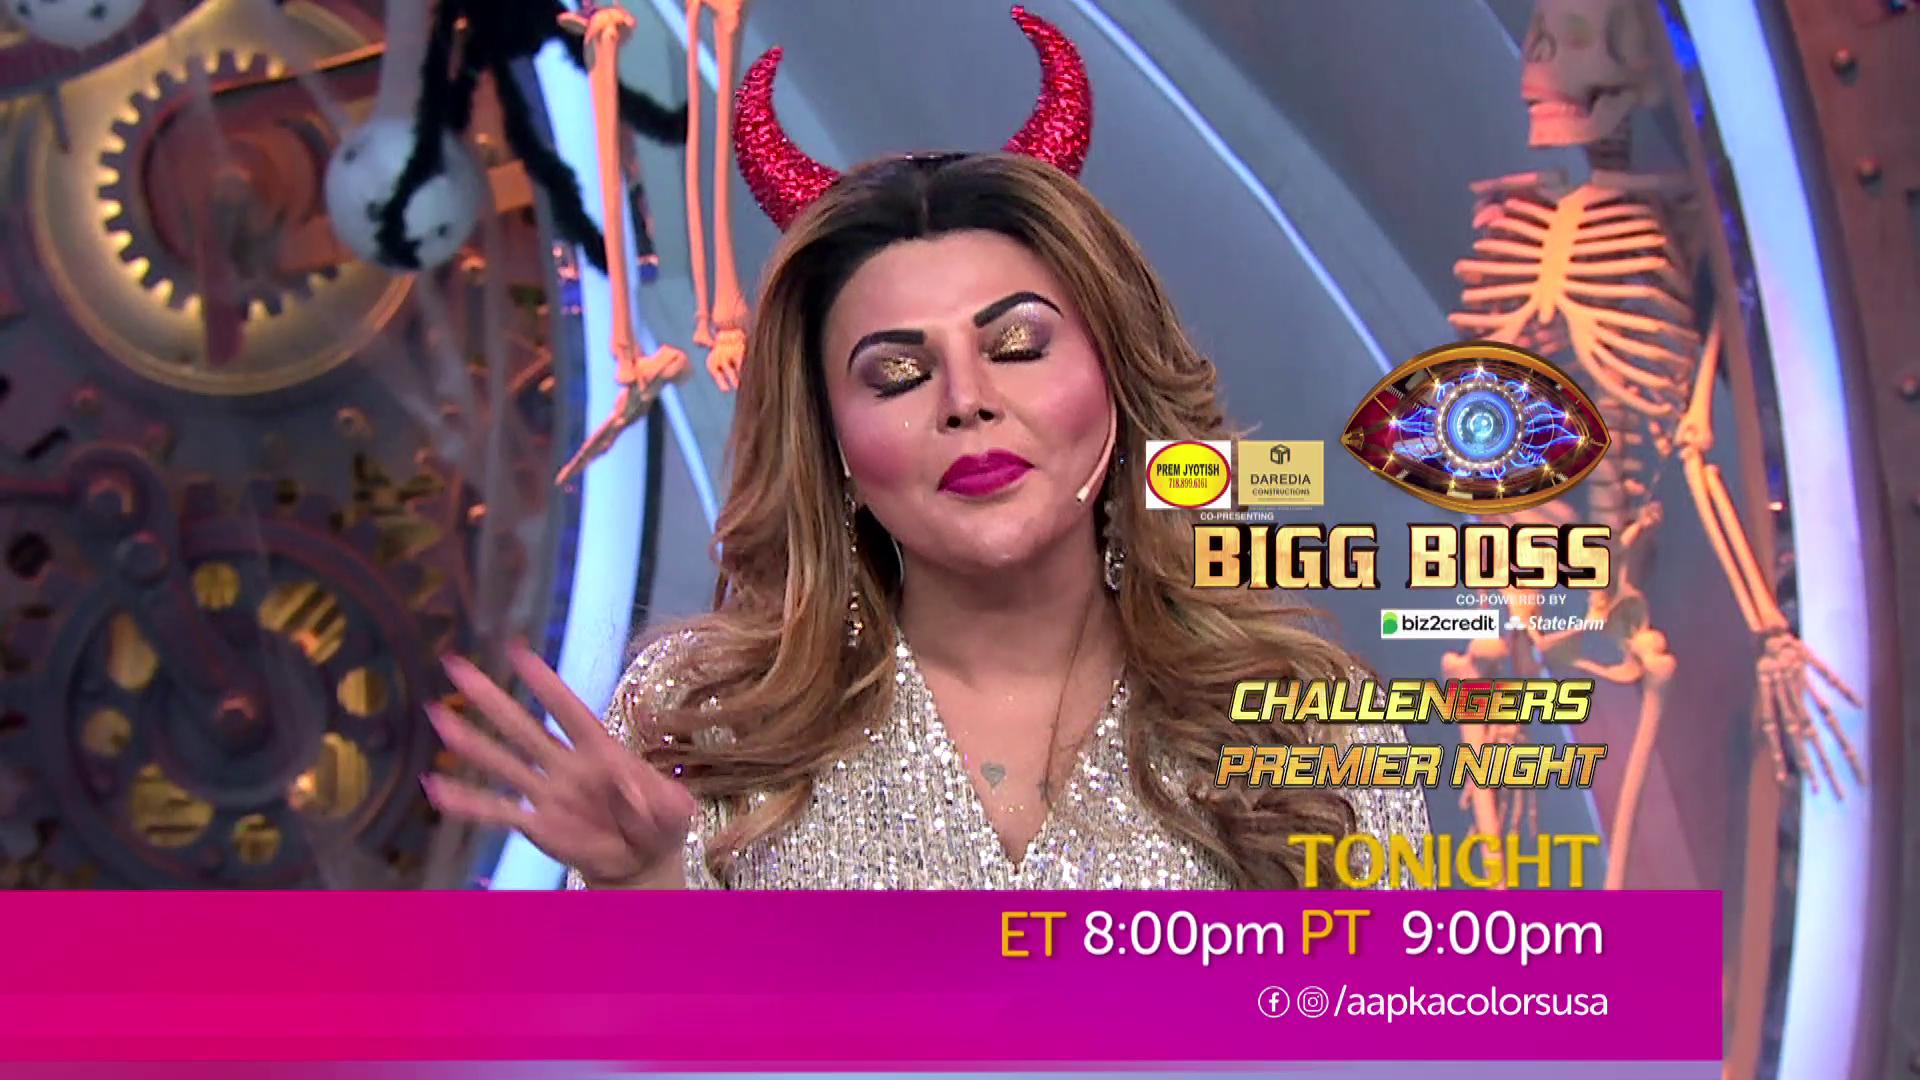 Watch Bigg Boss Challengers Premier Night Sat-Sun ET 8:00pm PT 9:00pm